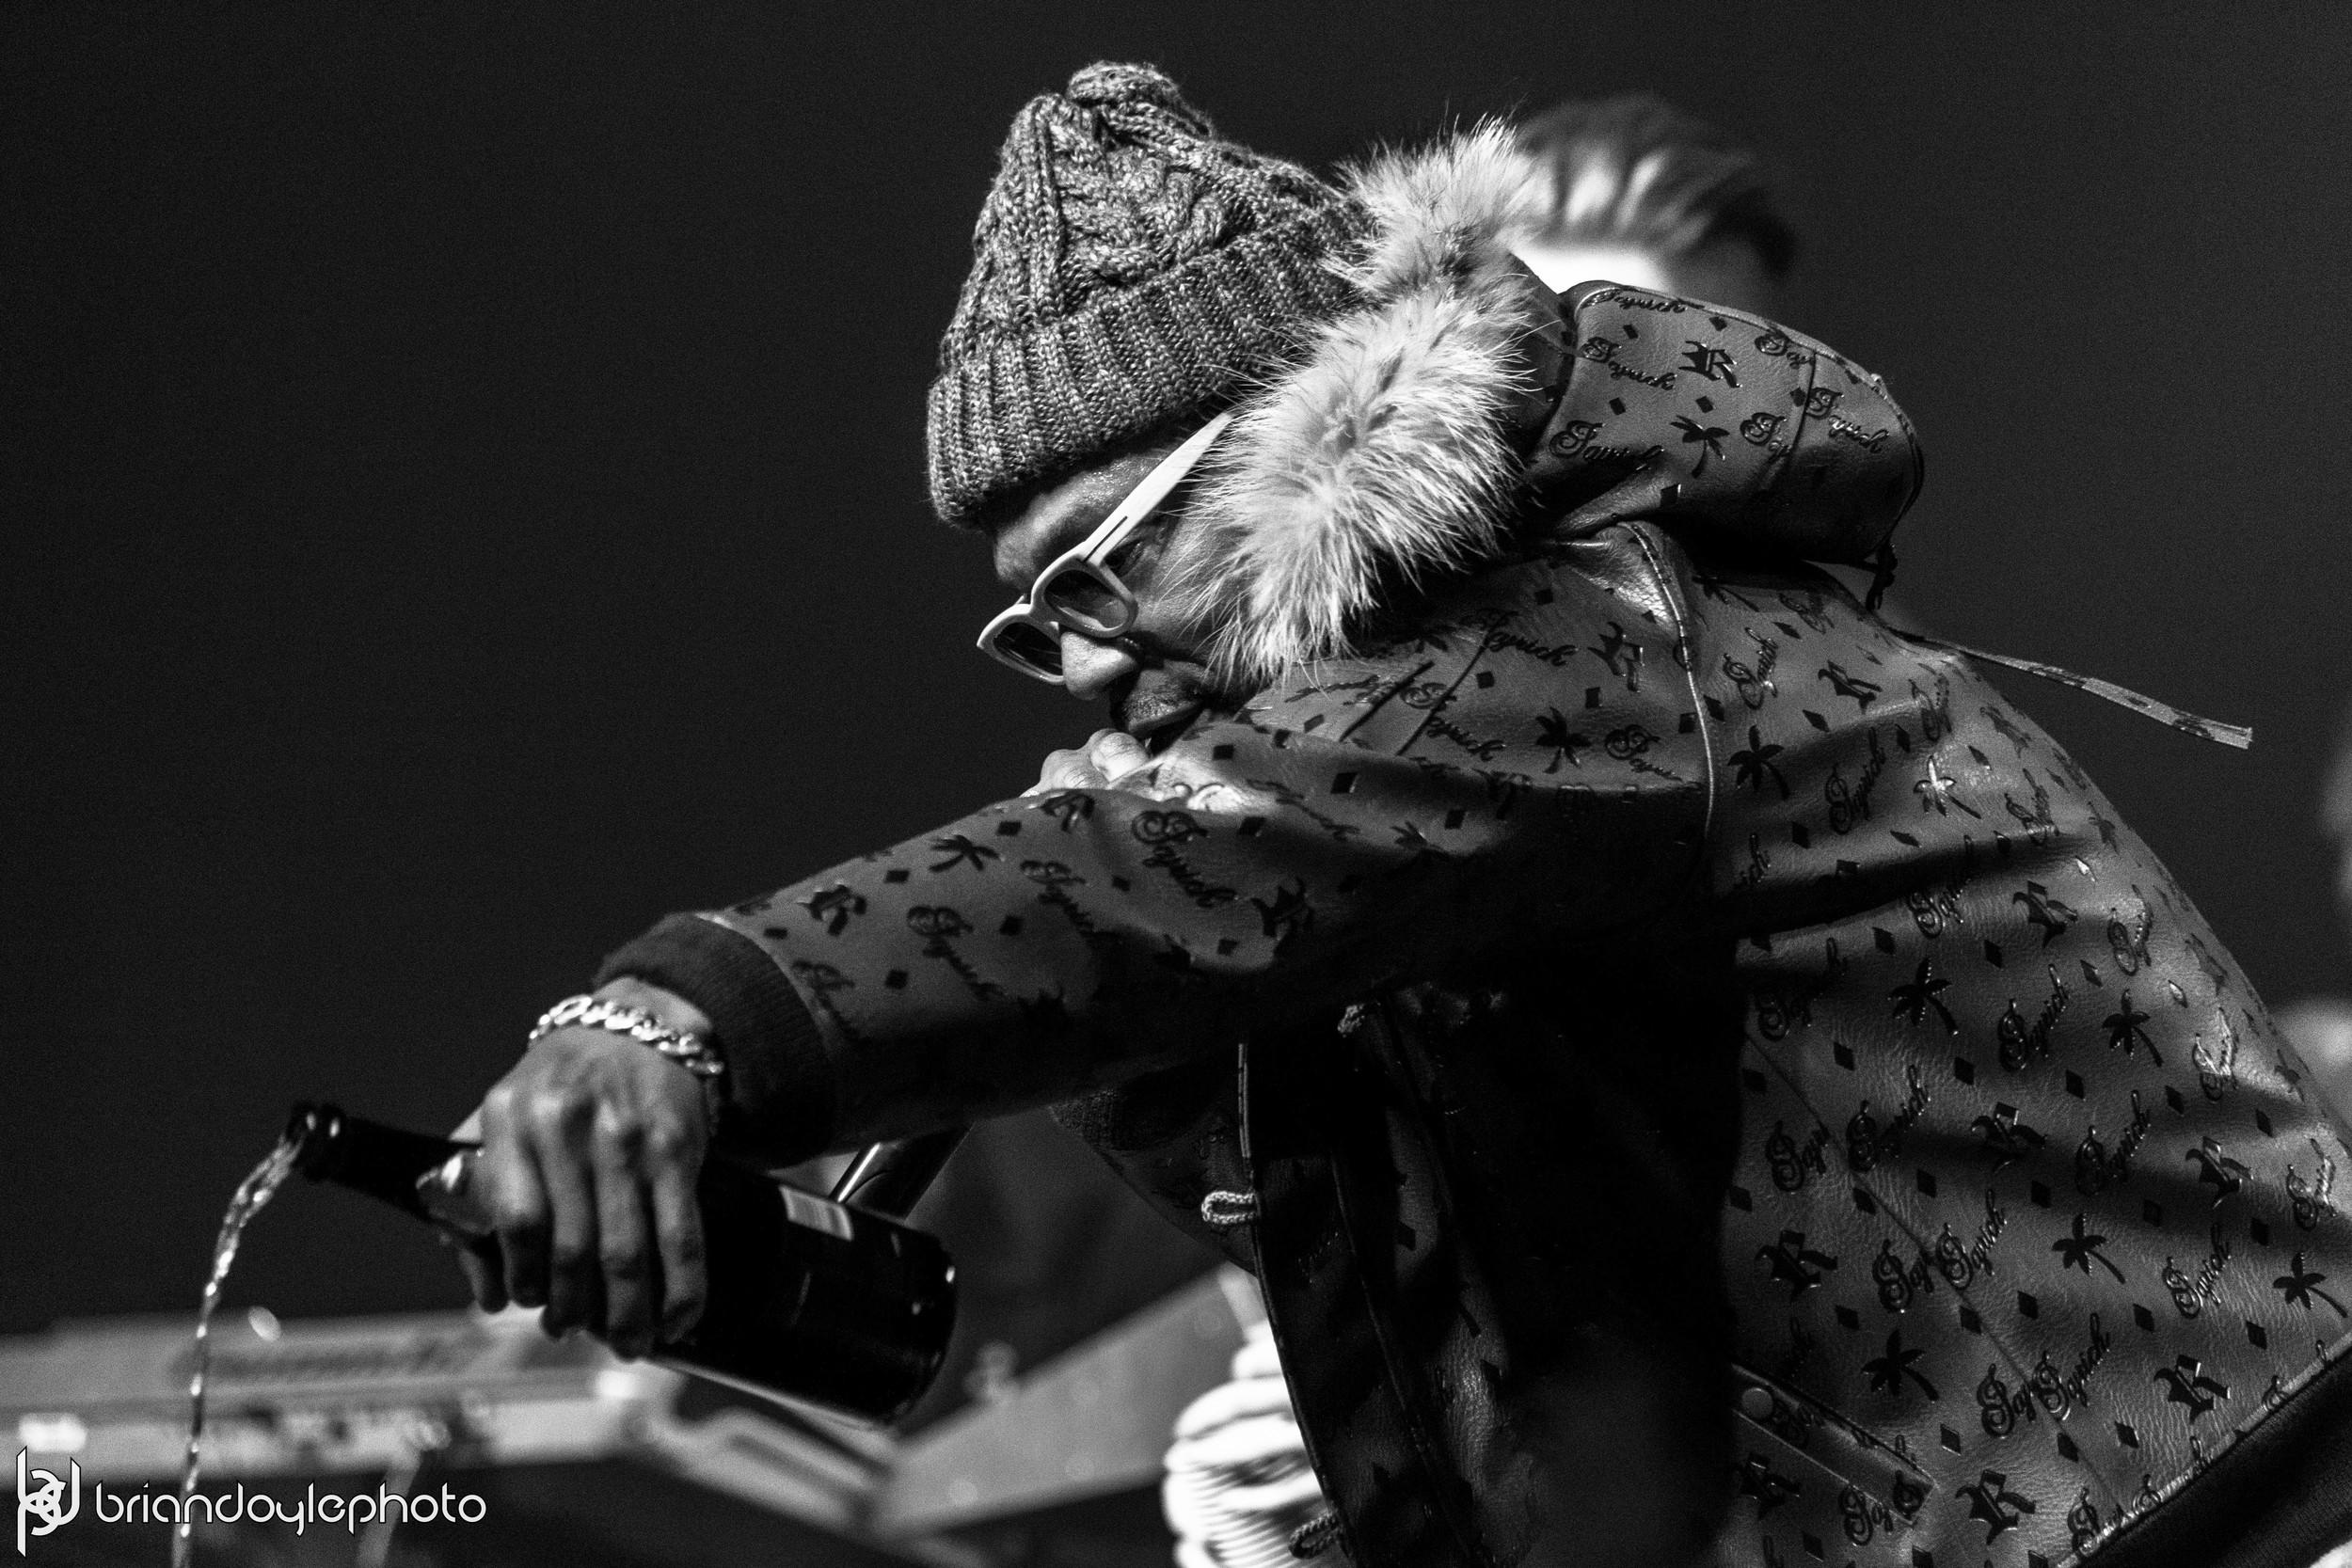 Lil Wayne, Juicy J, Two-9, Tree @ The Fonda 25.11.2014-32.jpg